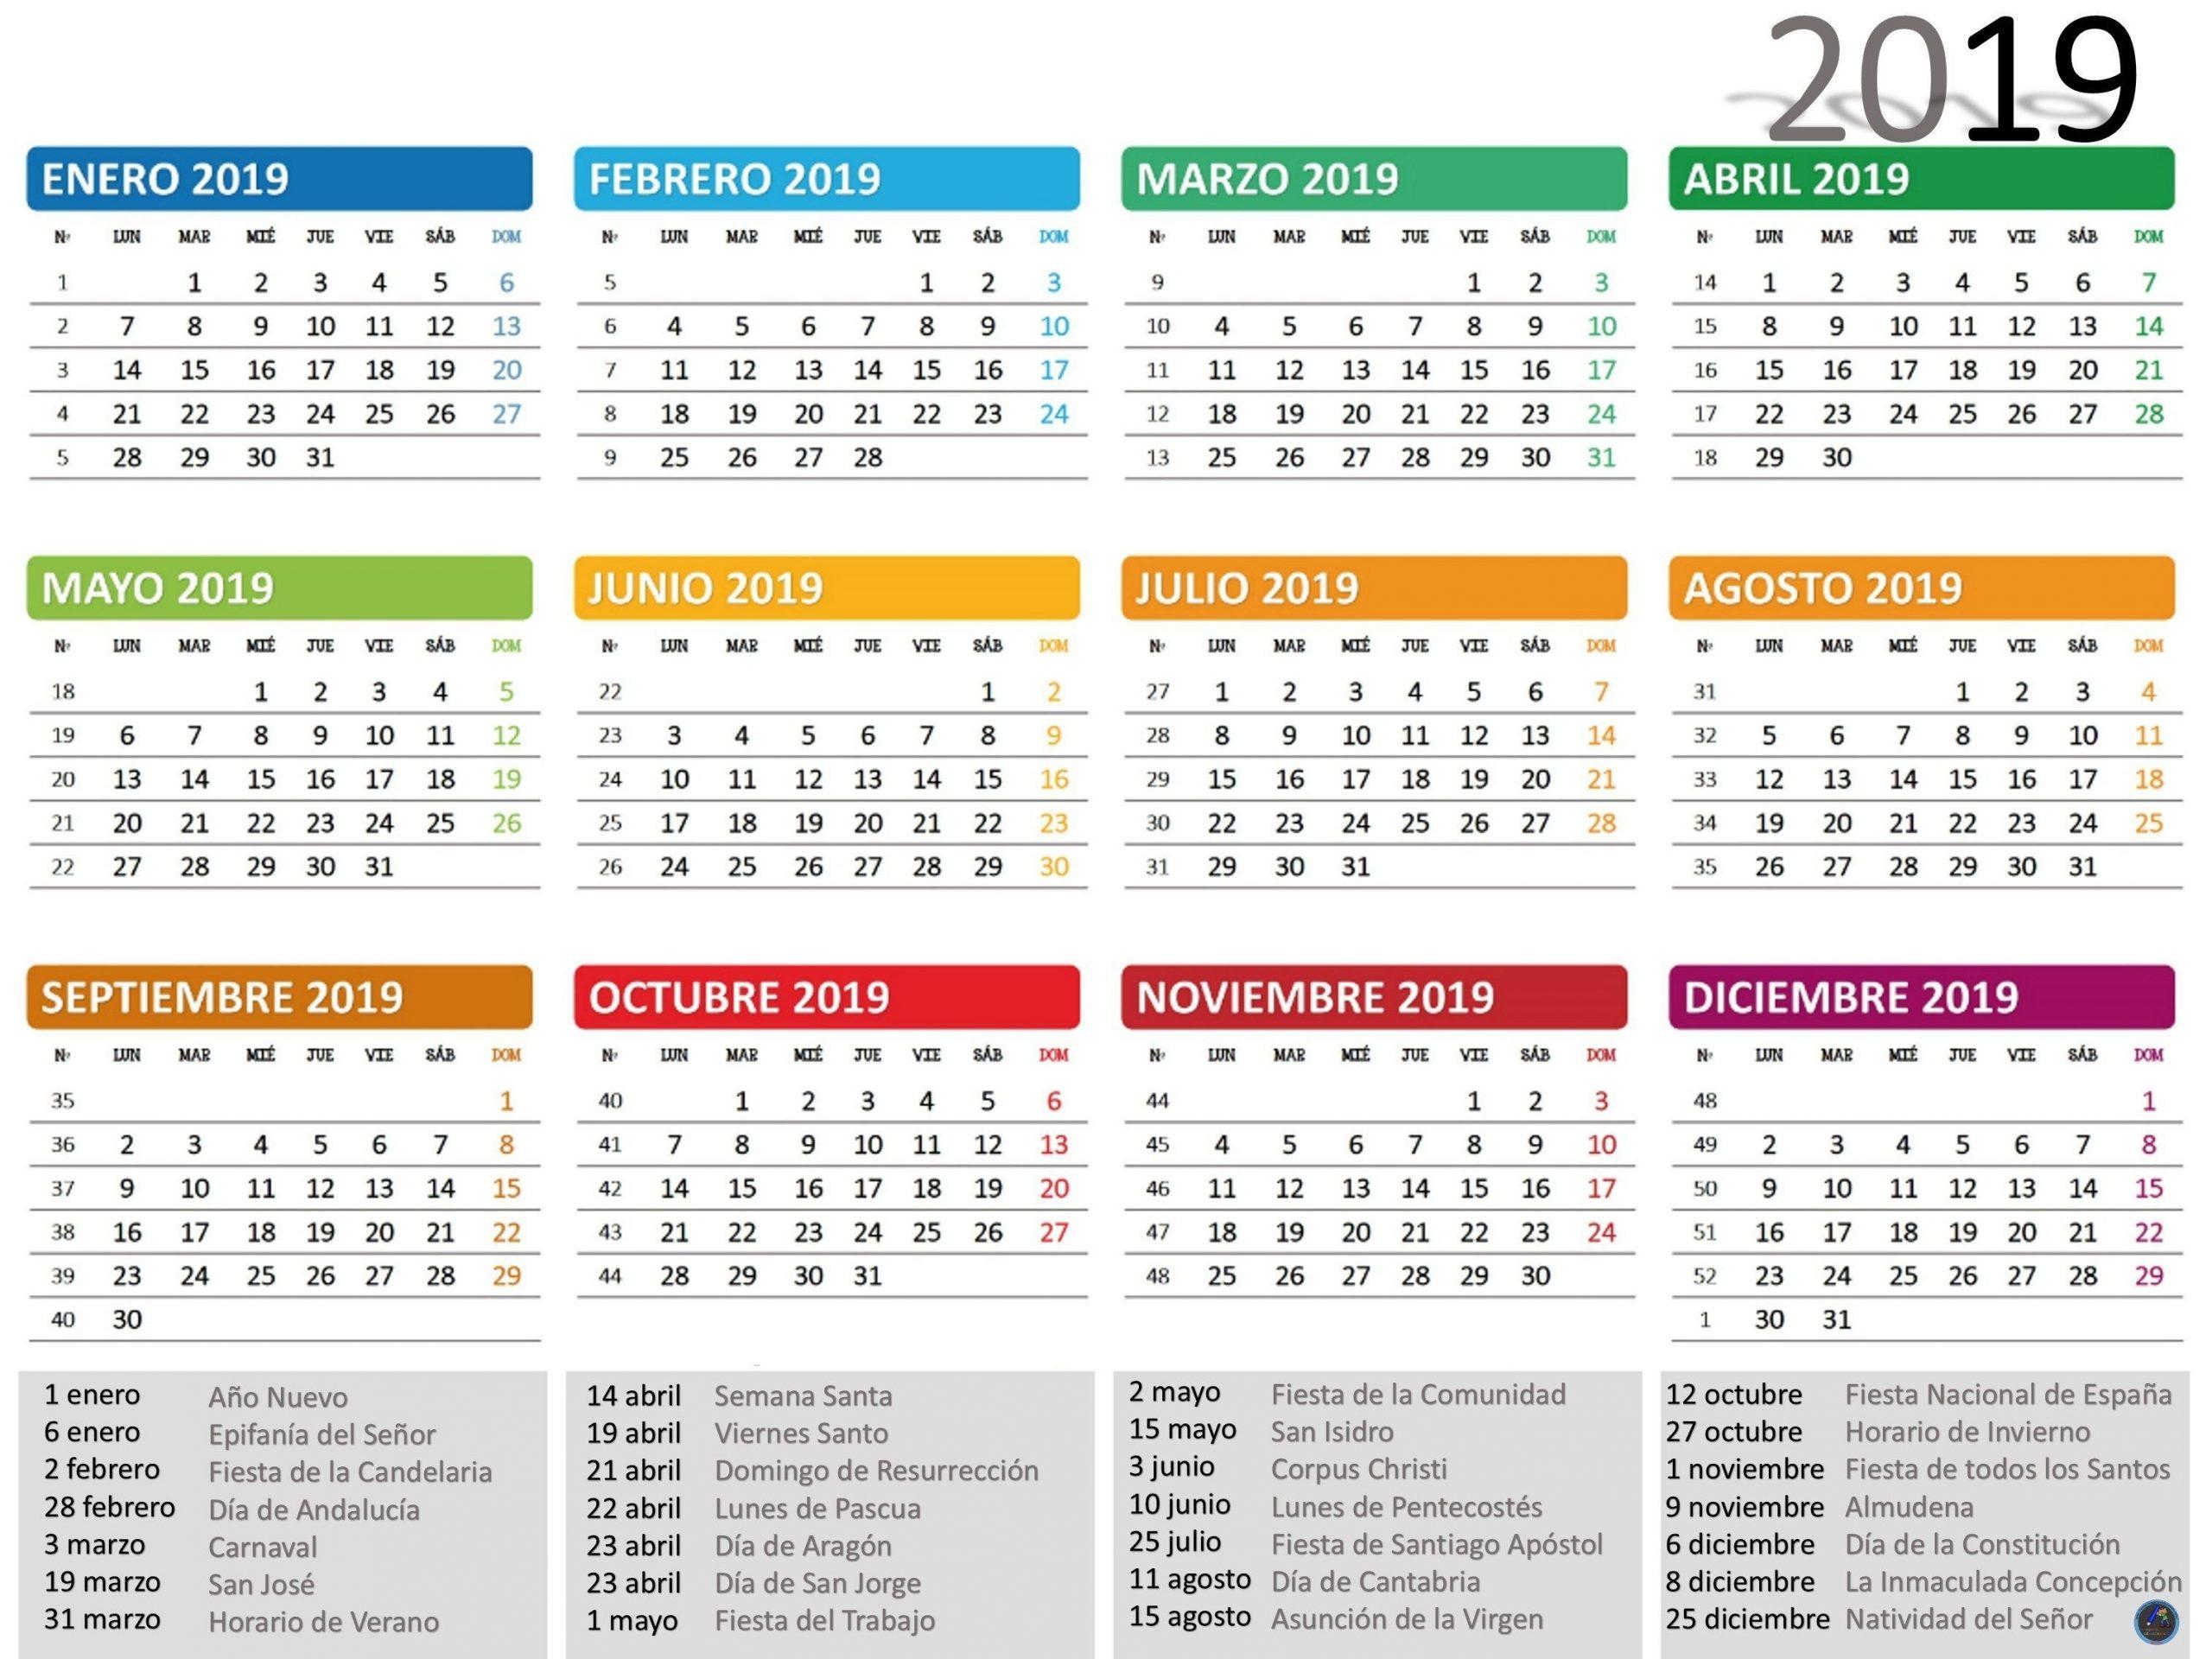 Calendario 2019 | Calendario Para Imprimir, Imprimir Sobres